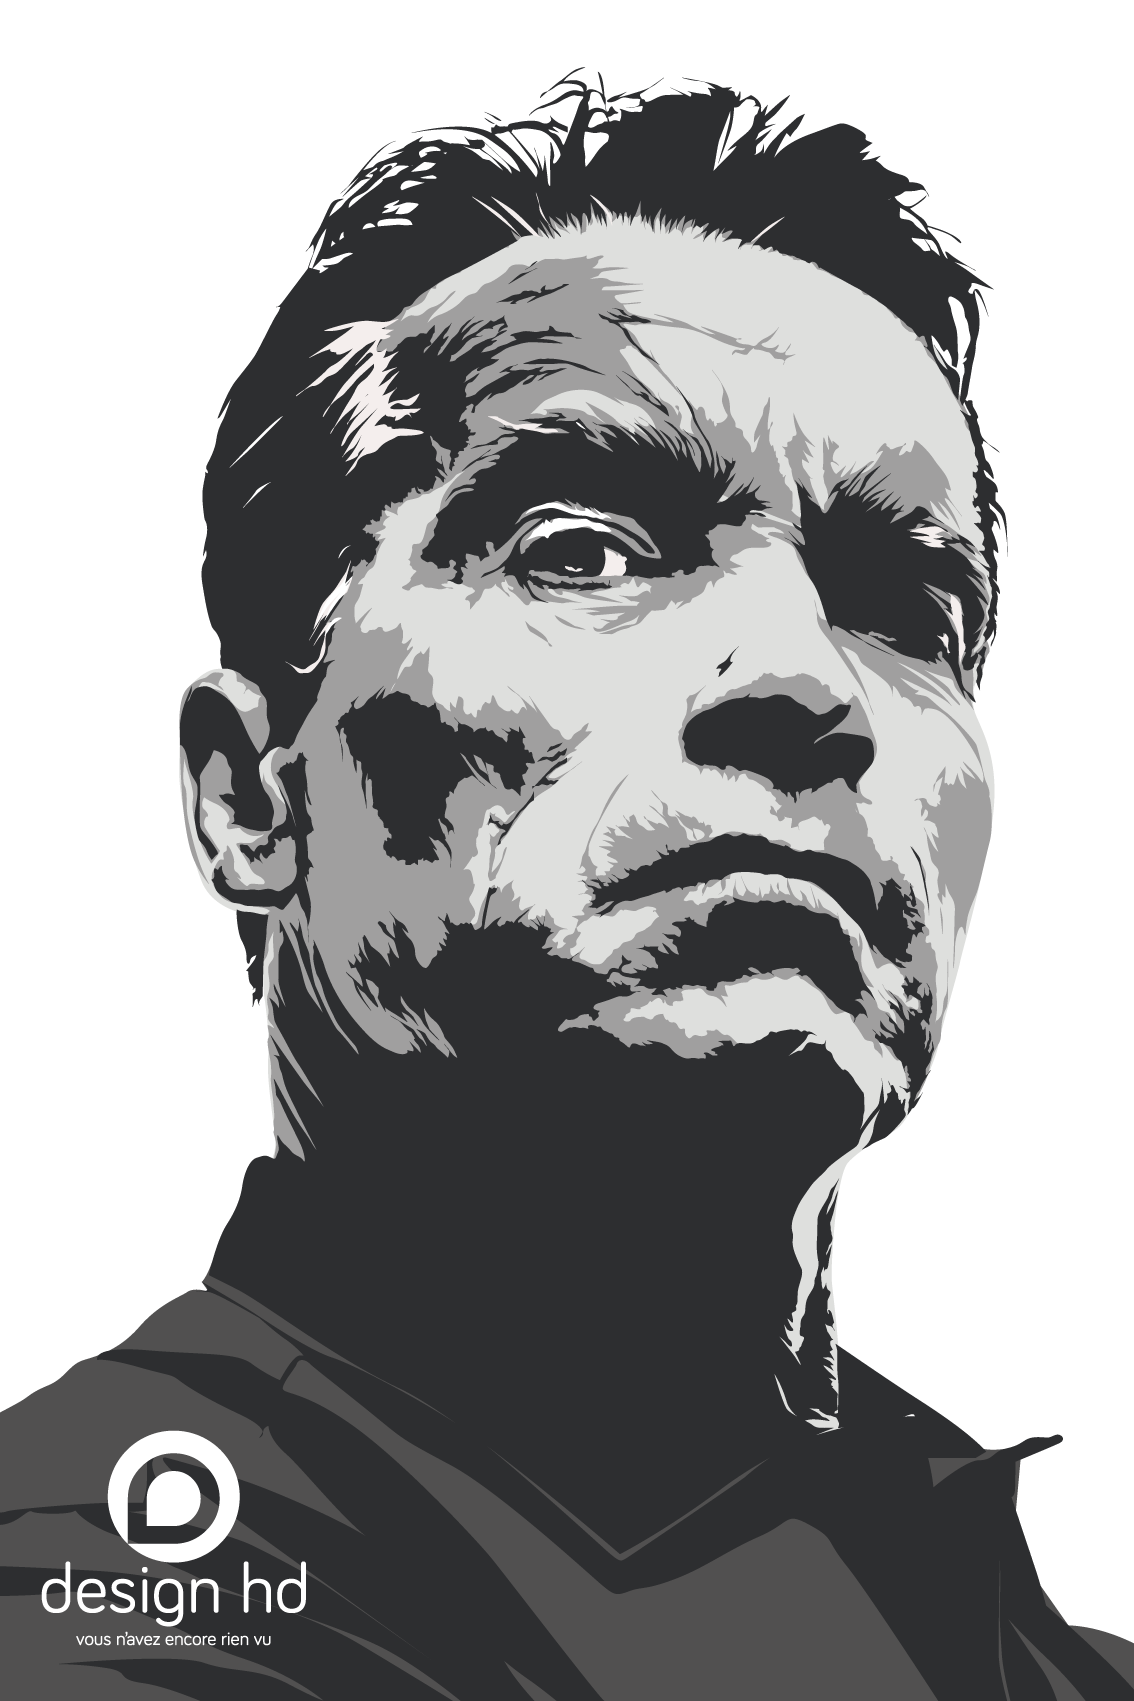 Arnold Schwarzenegger By Designhd Schwarzenegger Schwarzy Governator Vector Adobe Pochoir Peinture Encre De Chine